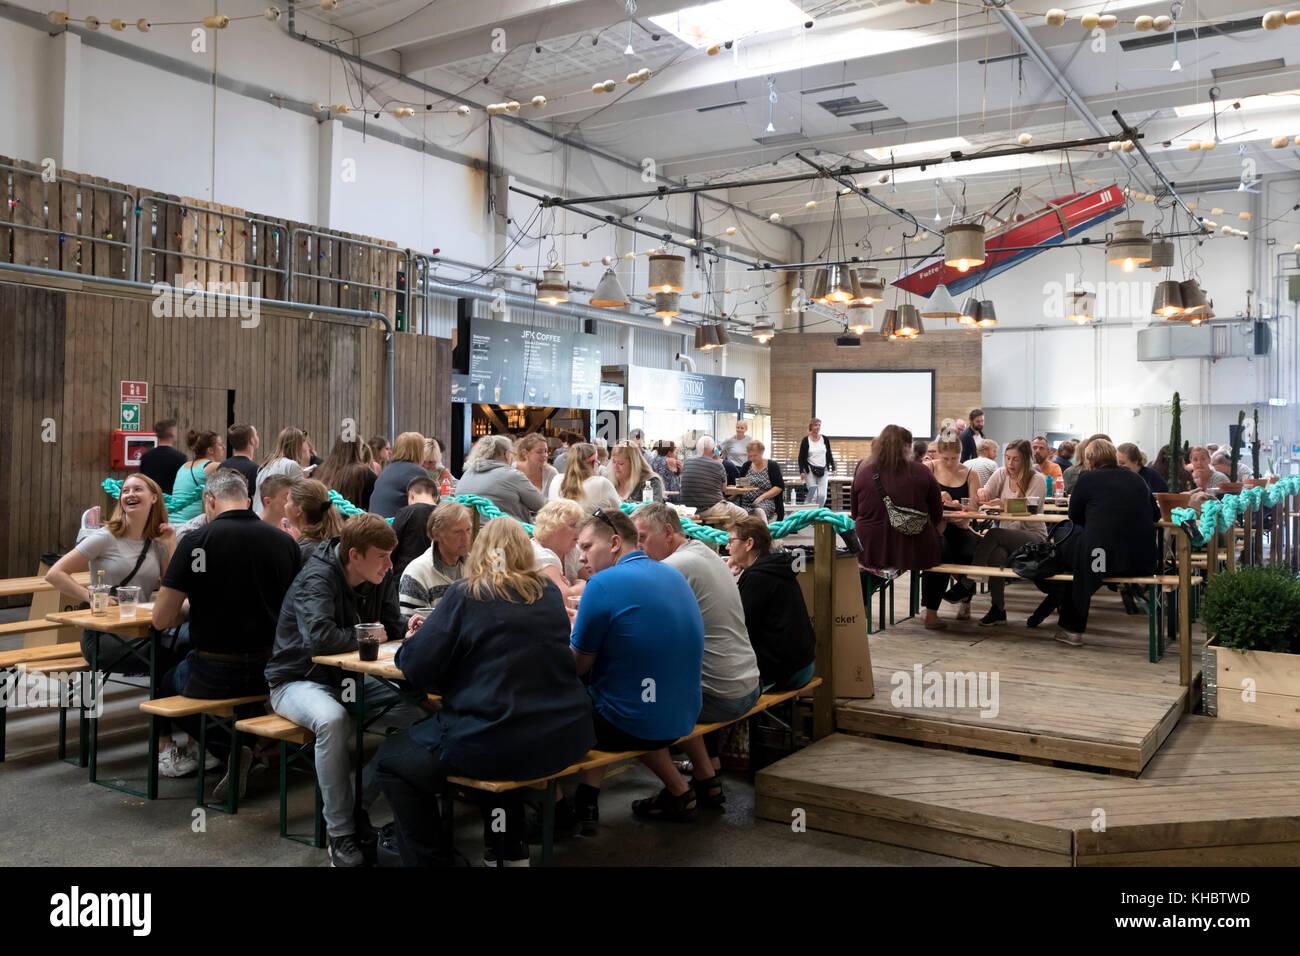 Interior of Boatyard Food Market, Helsingor, Zealand, Denmark, Europe - Stock Image